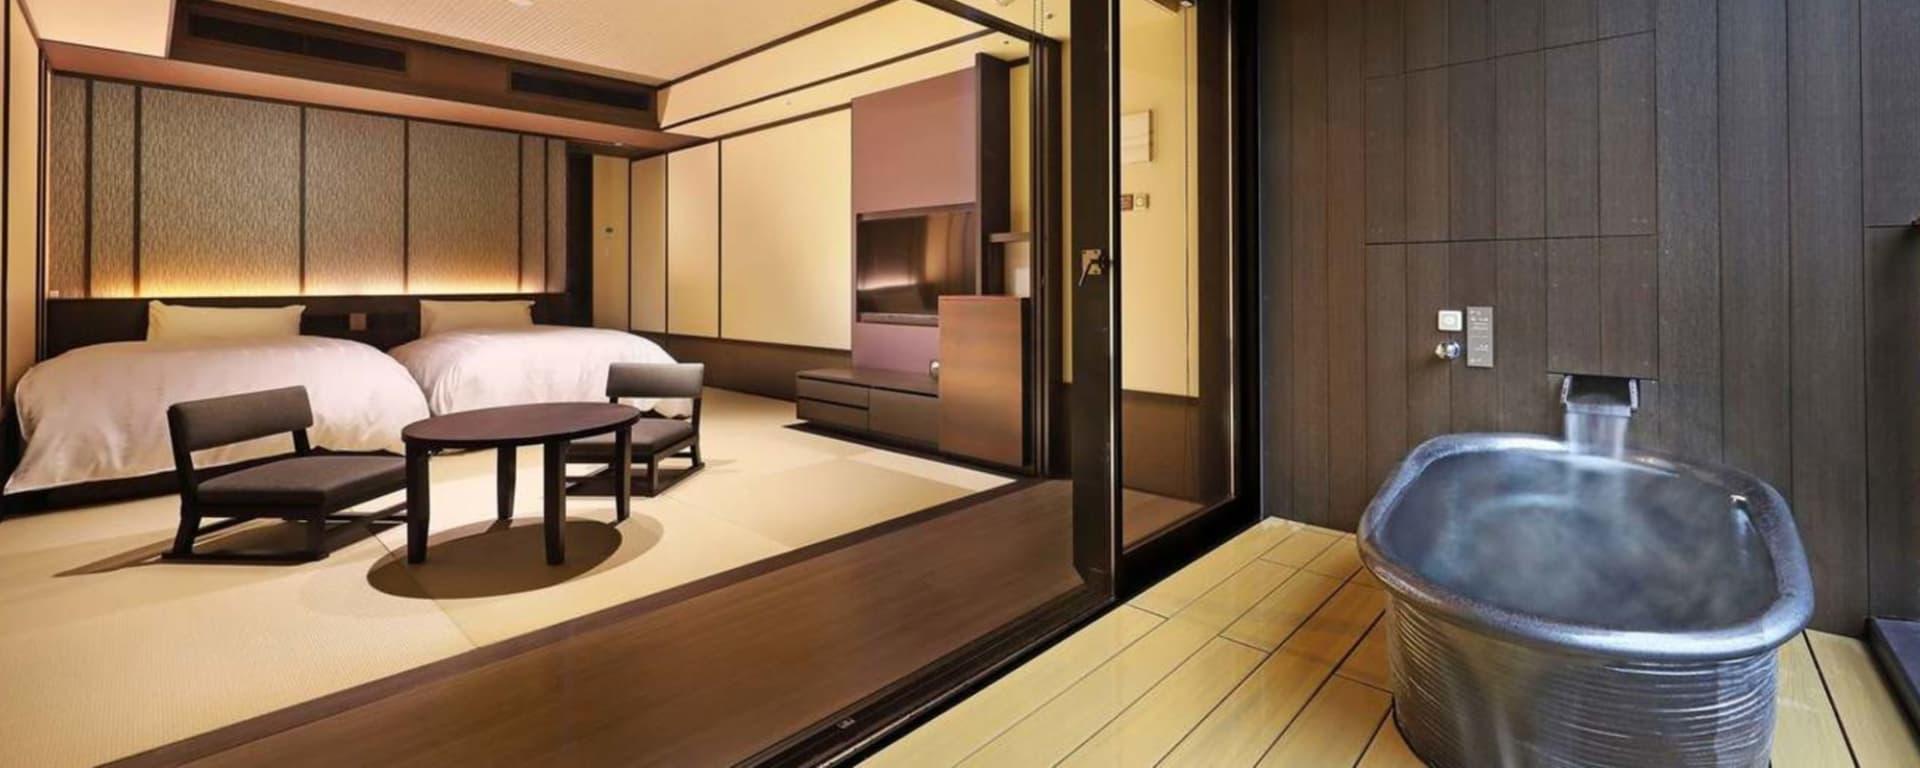 Kowakien Tenyu Ryokan in Hakone: Deluxe Japanese room w open air bath